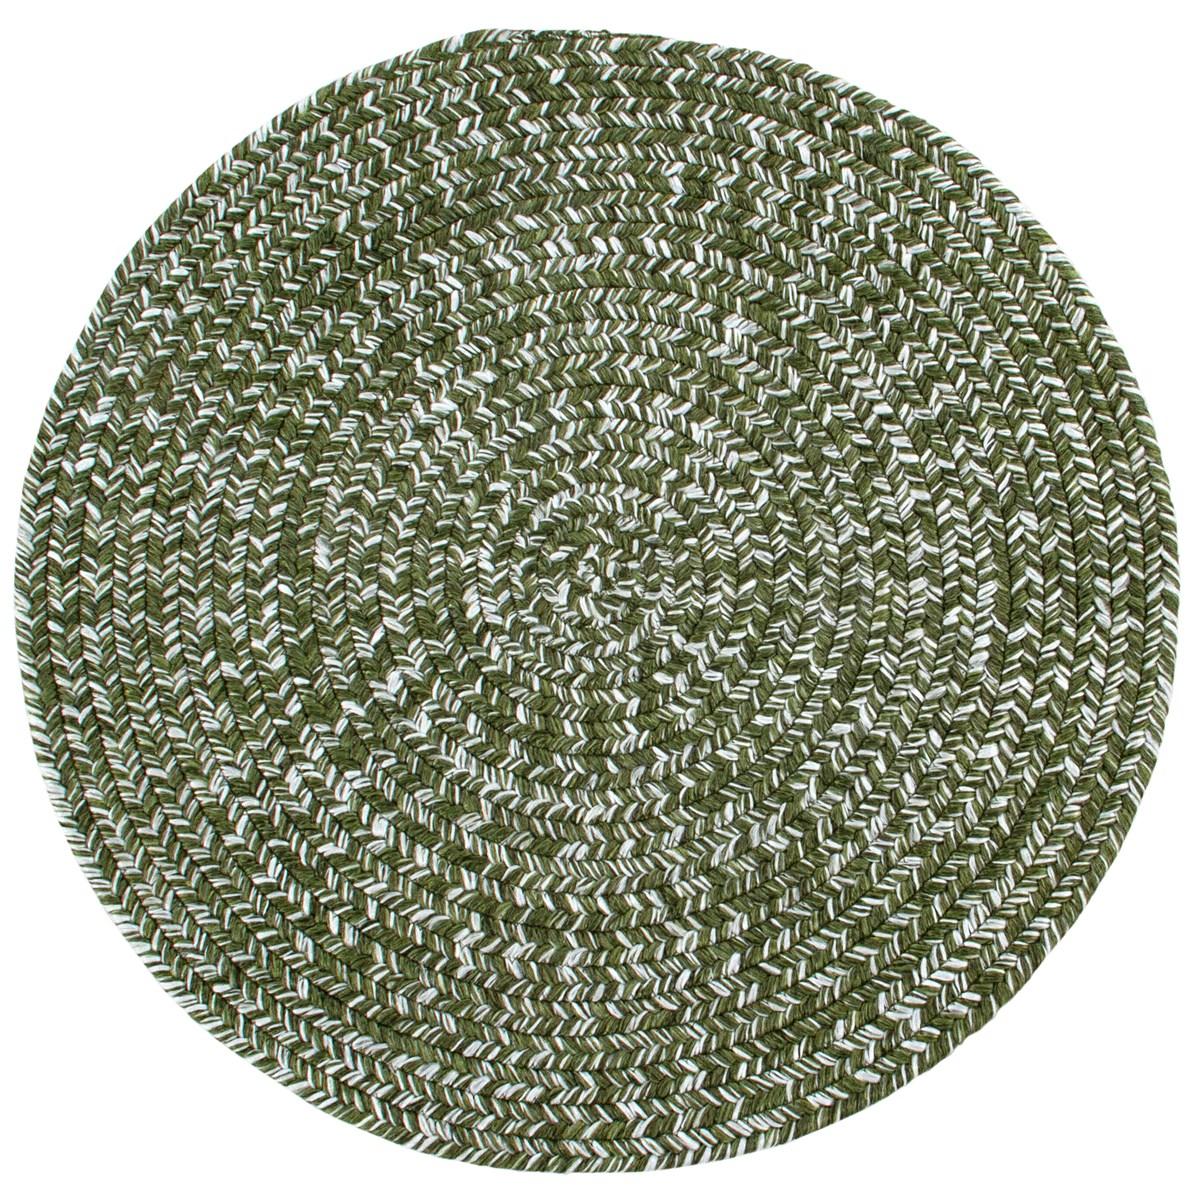 Tapis de salon en Polypropylène Vert olive 140x200 cm